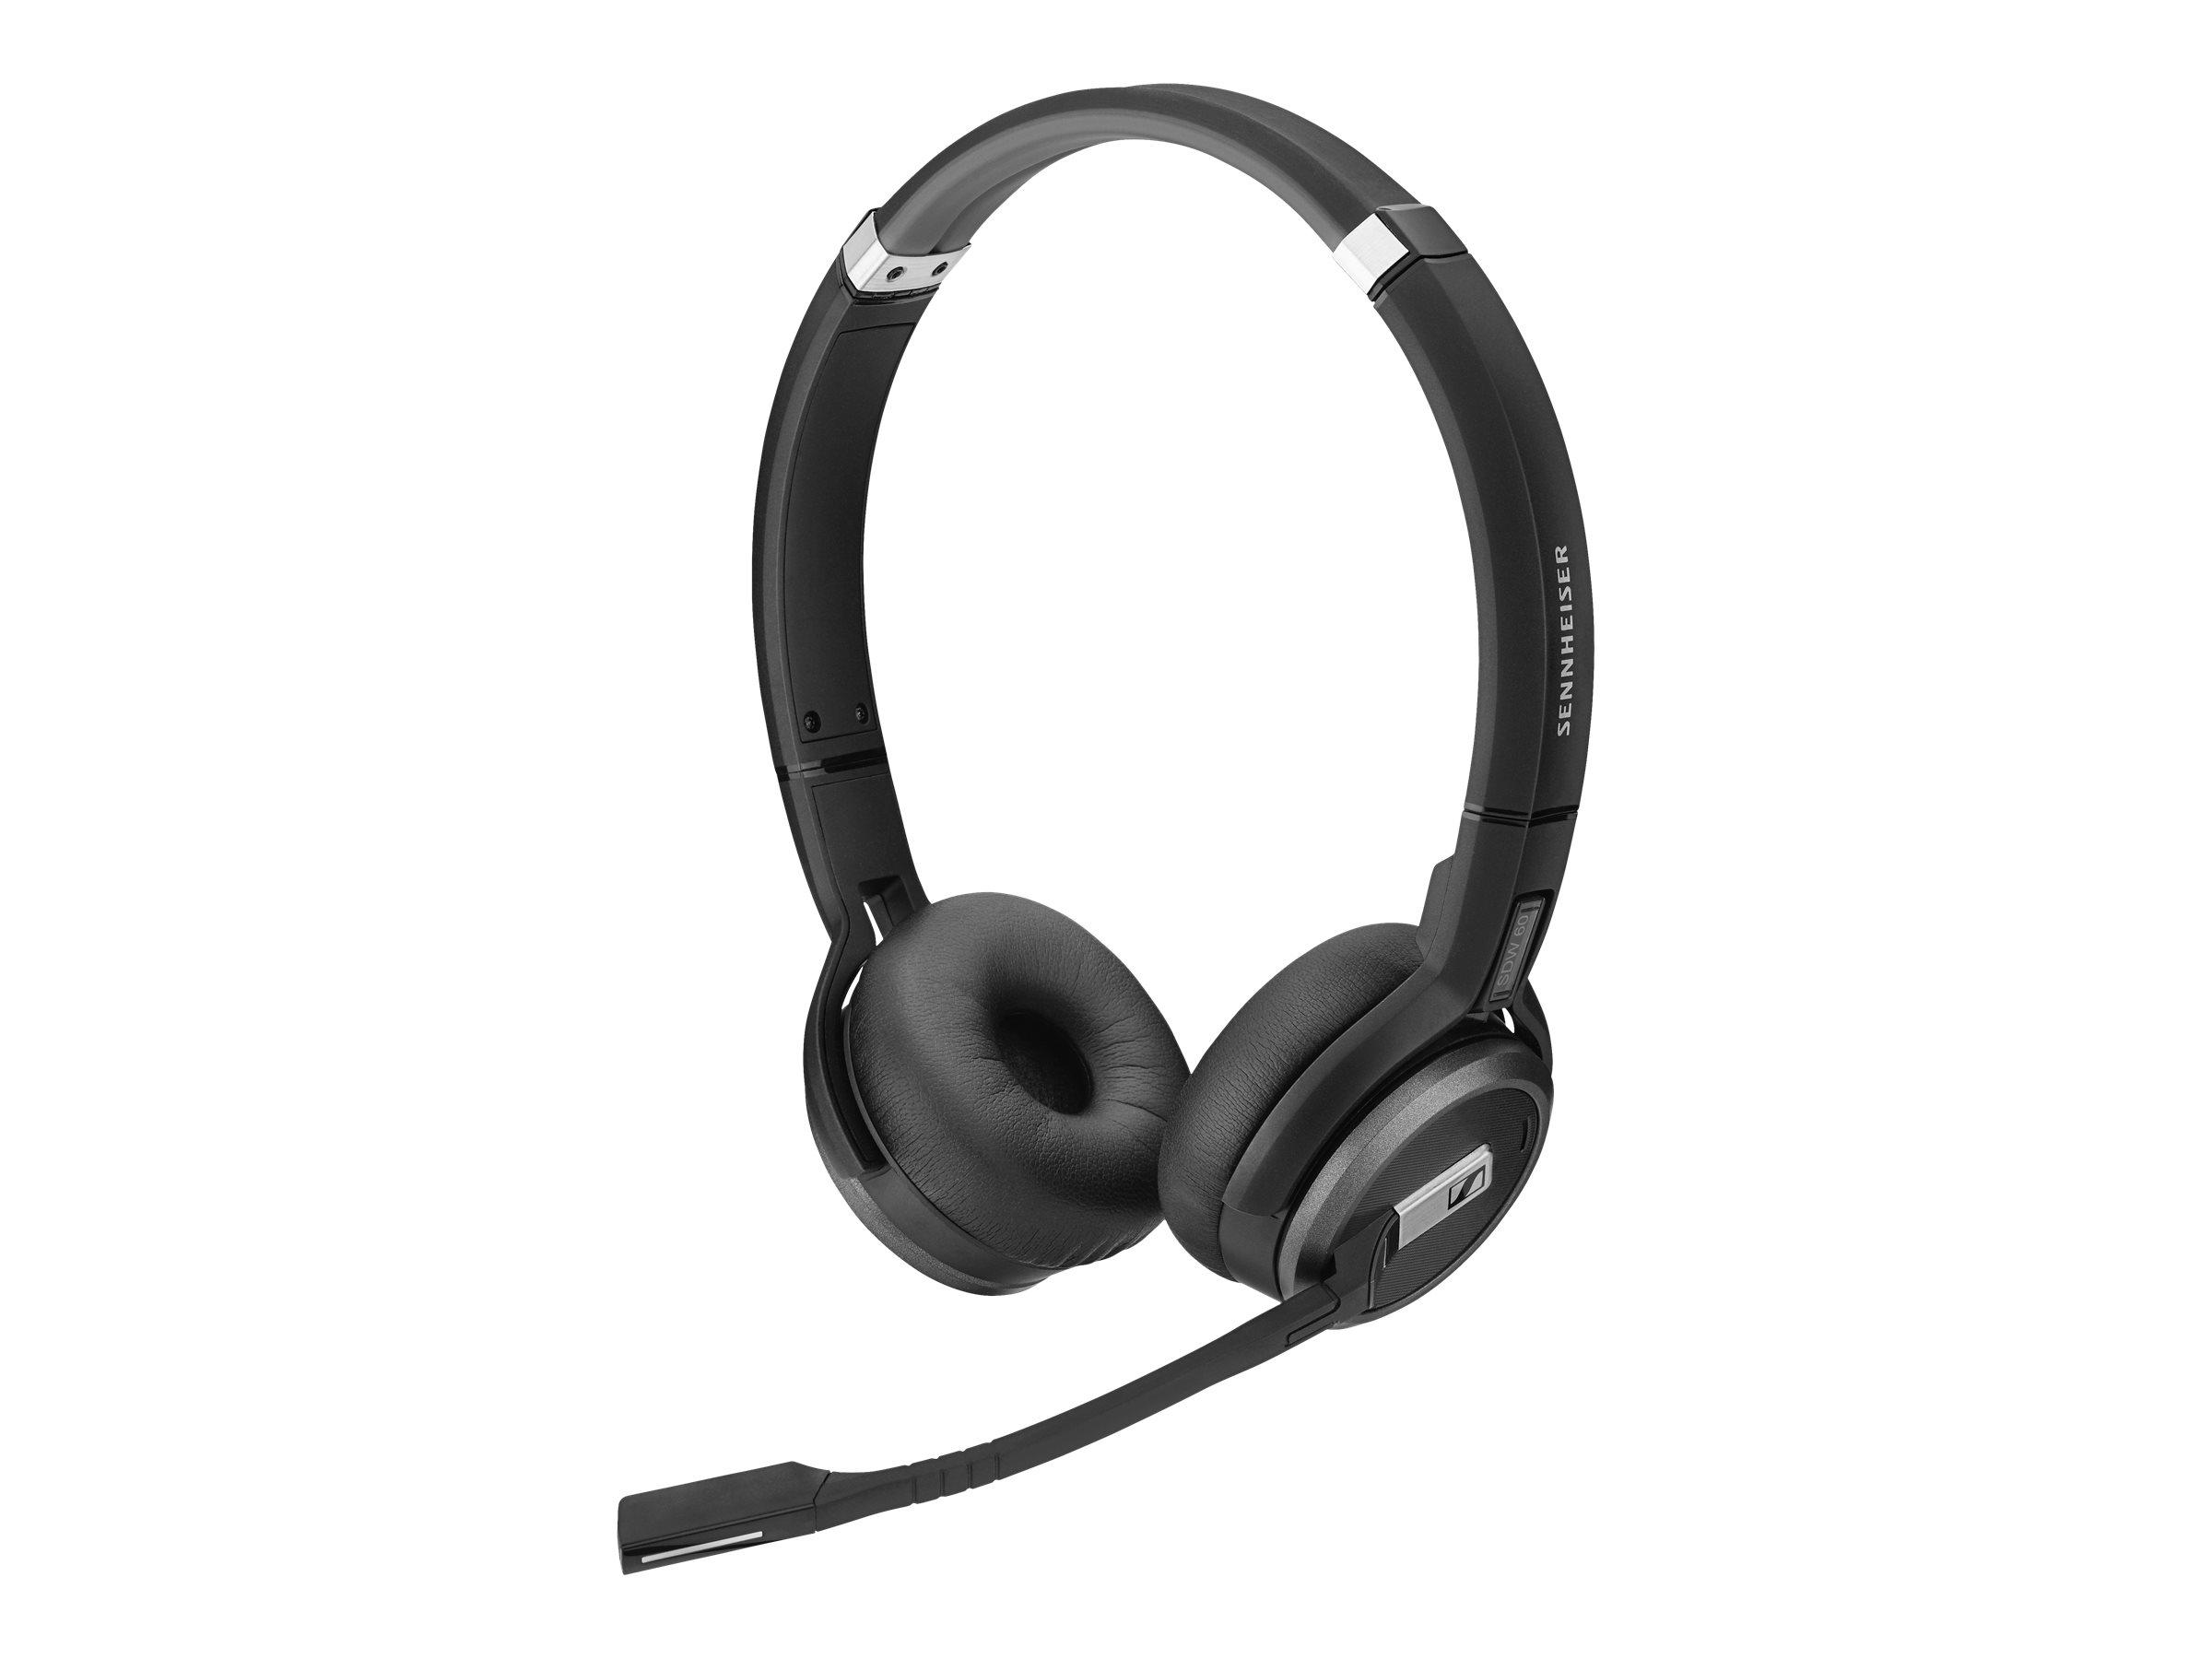 Sennheiser SDW 60 HS - Headset - On-Ear - DECT - kabellos - aktive Rauschunterdrückung